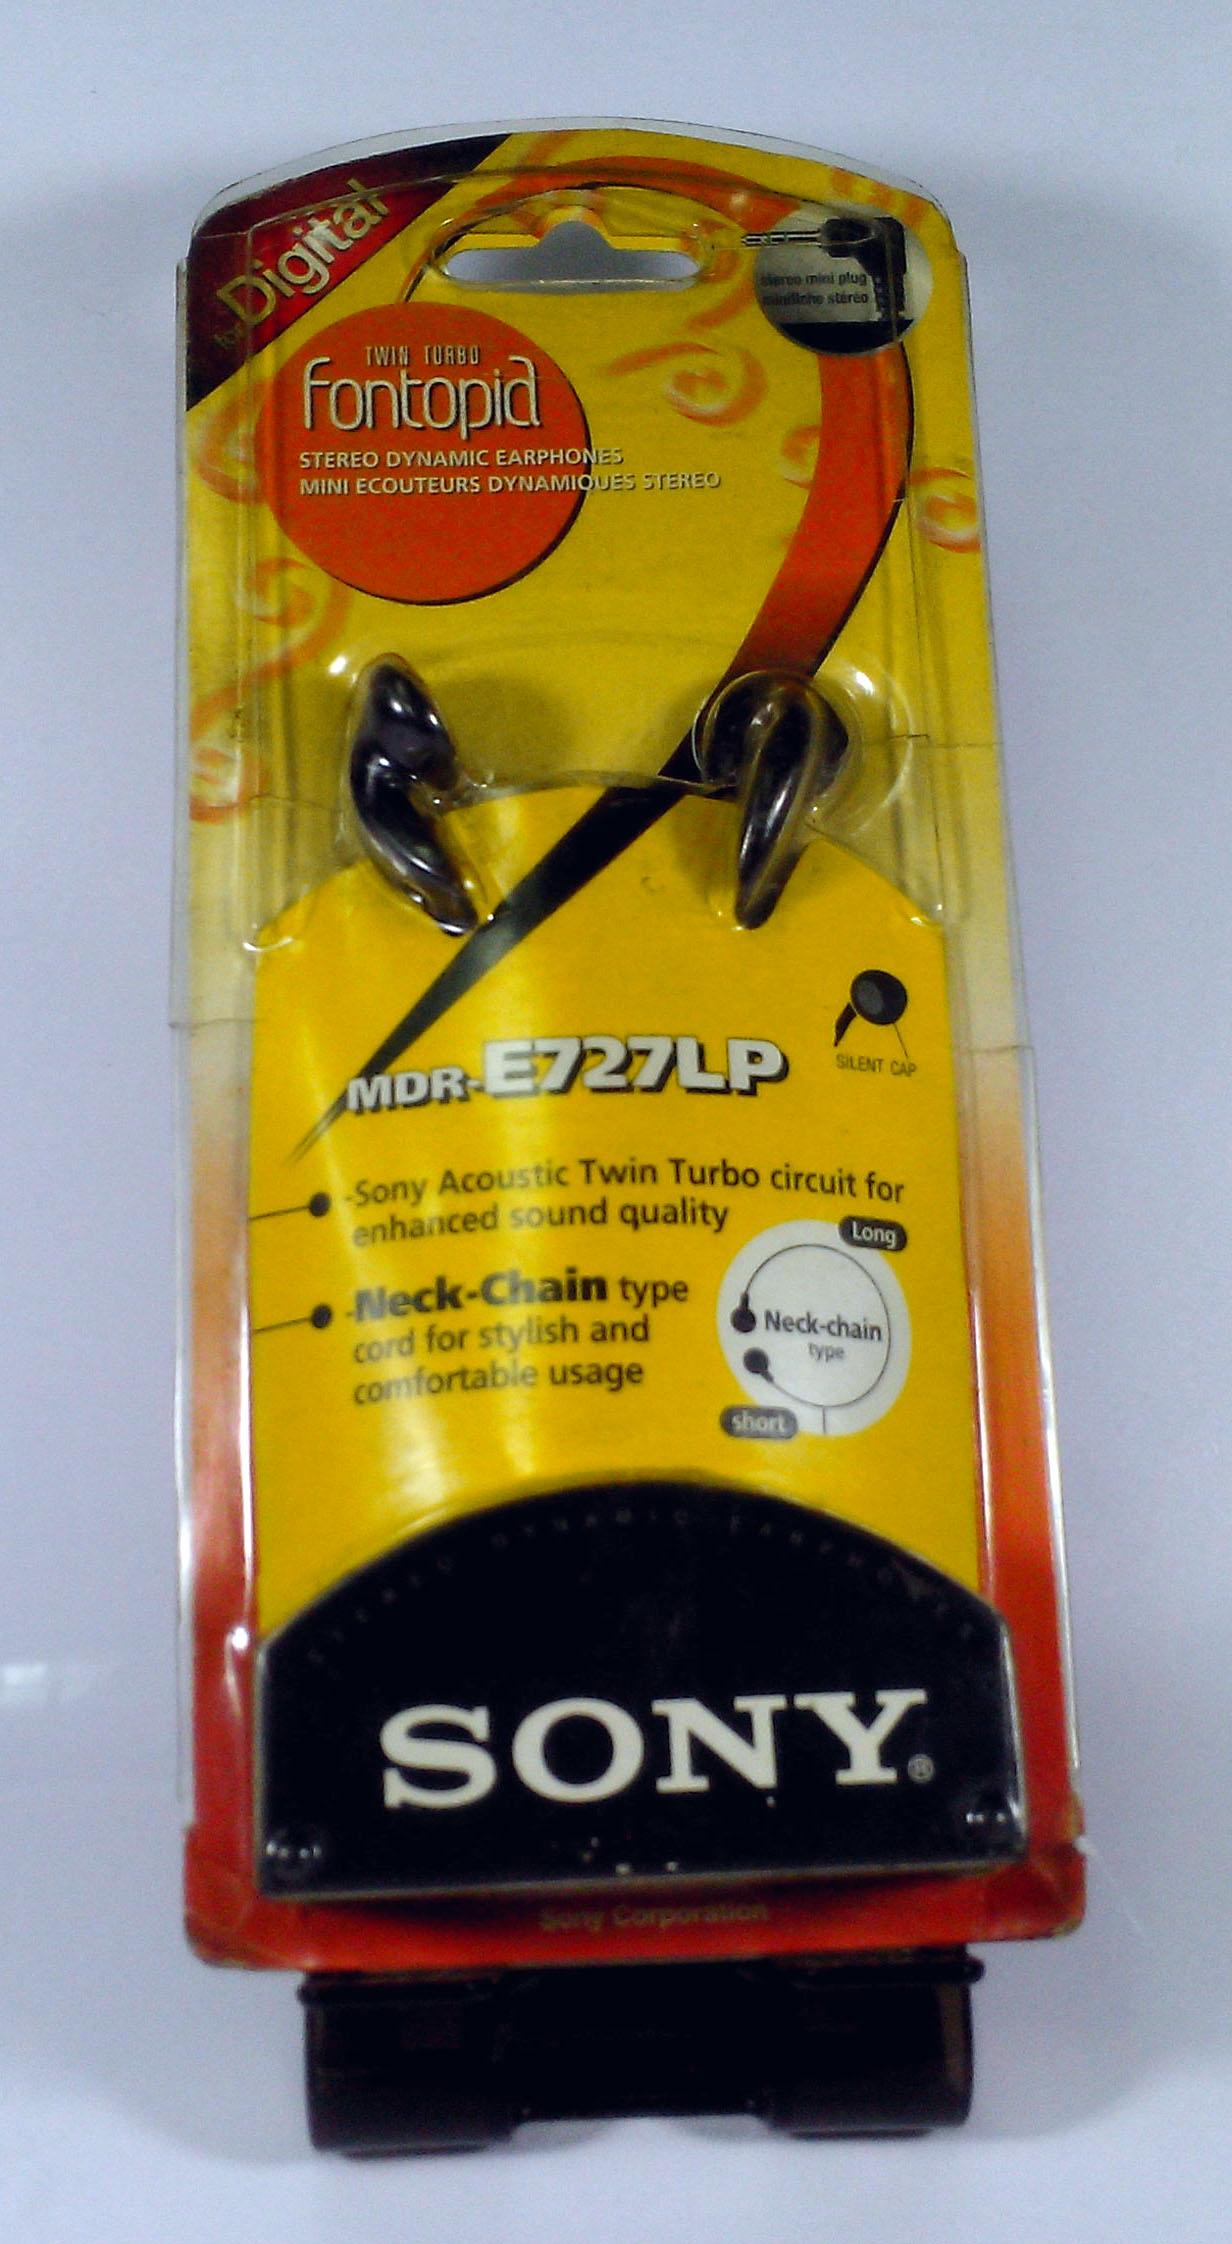 Sony MDR-E727LP มือหนึ่ง